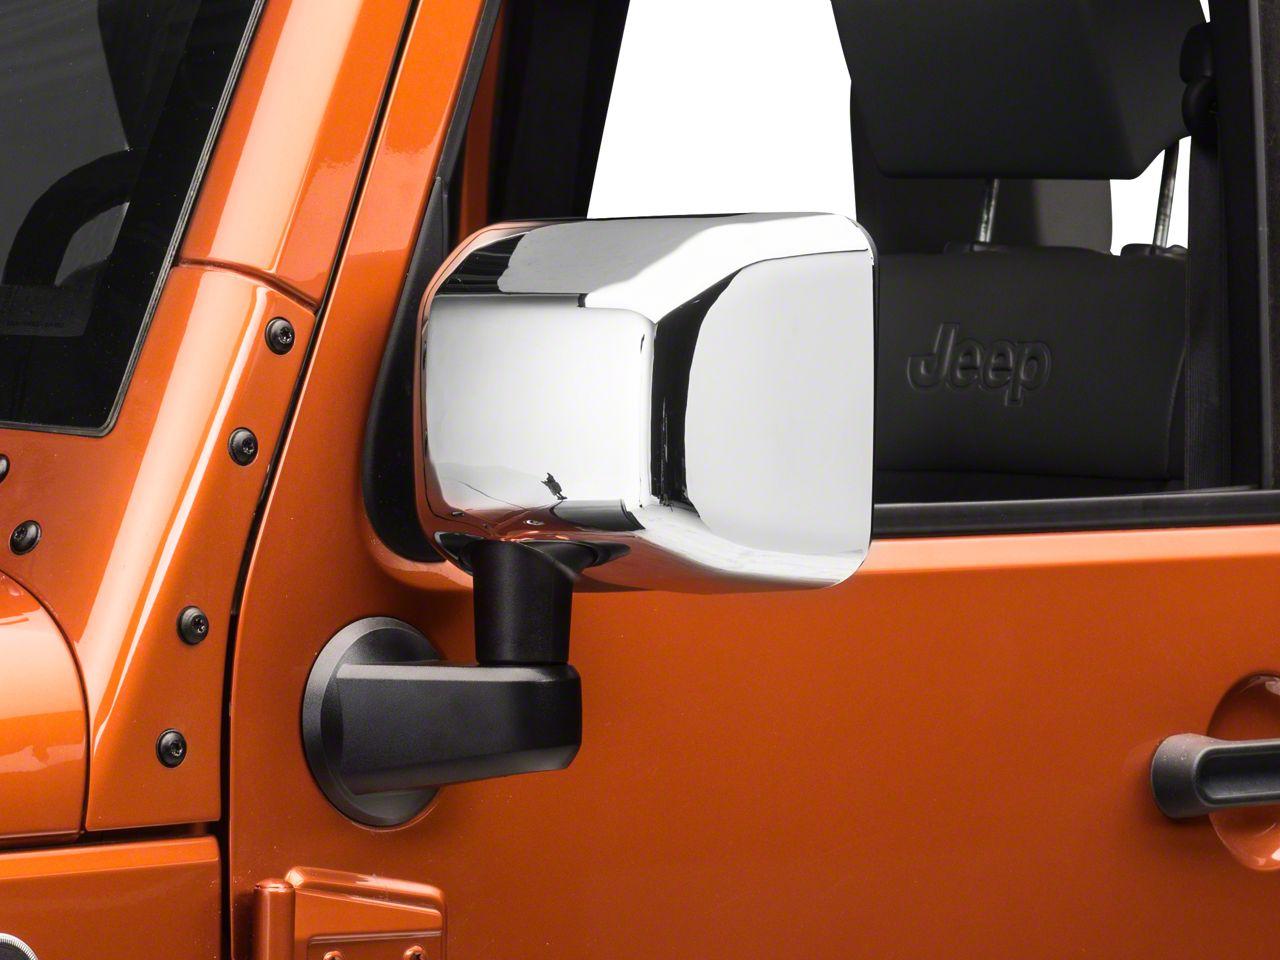 Rugged Ridge Mirror Covers - Chrome (07-18 Jeep Wrangler JK)